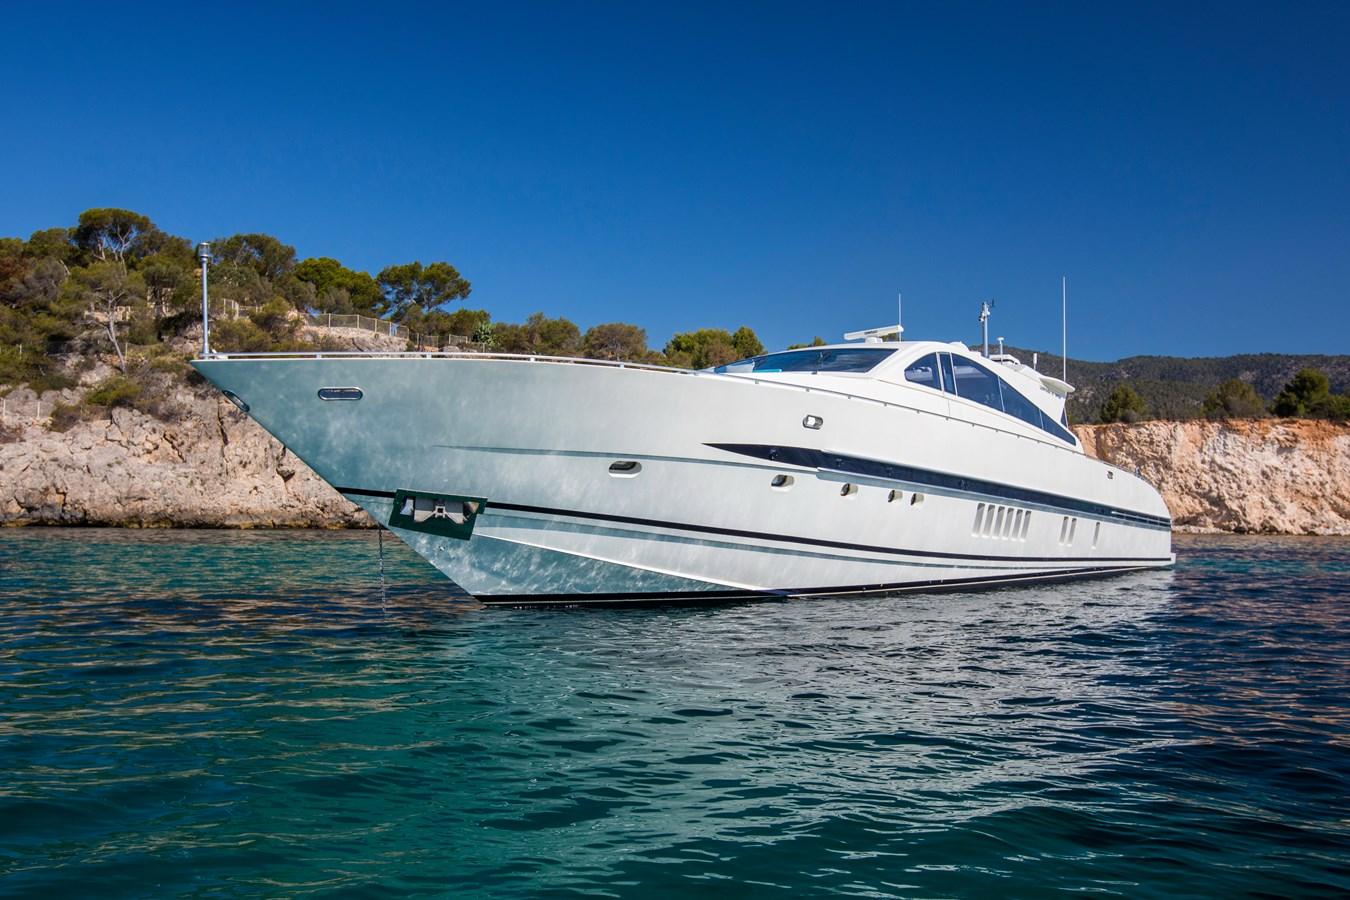 CITA yacht for sale